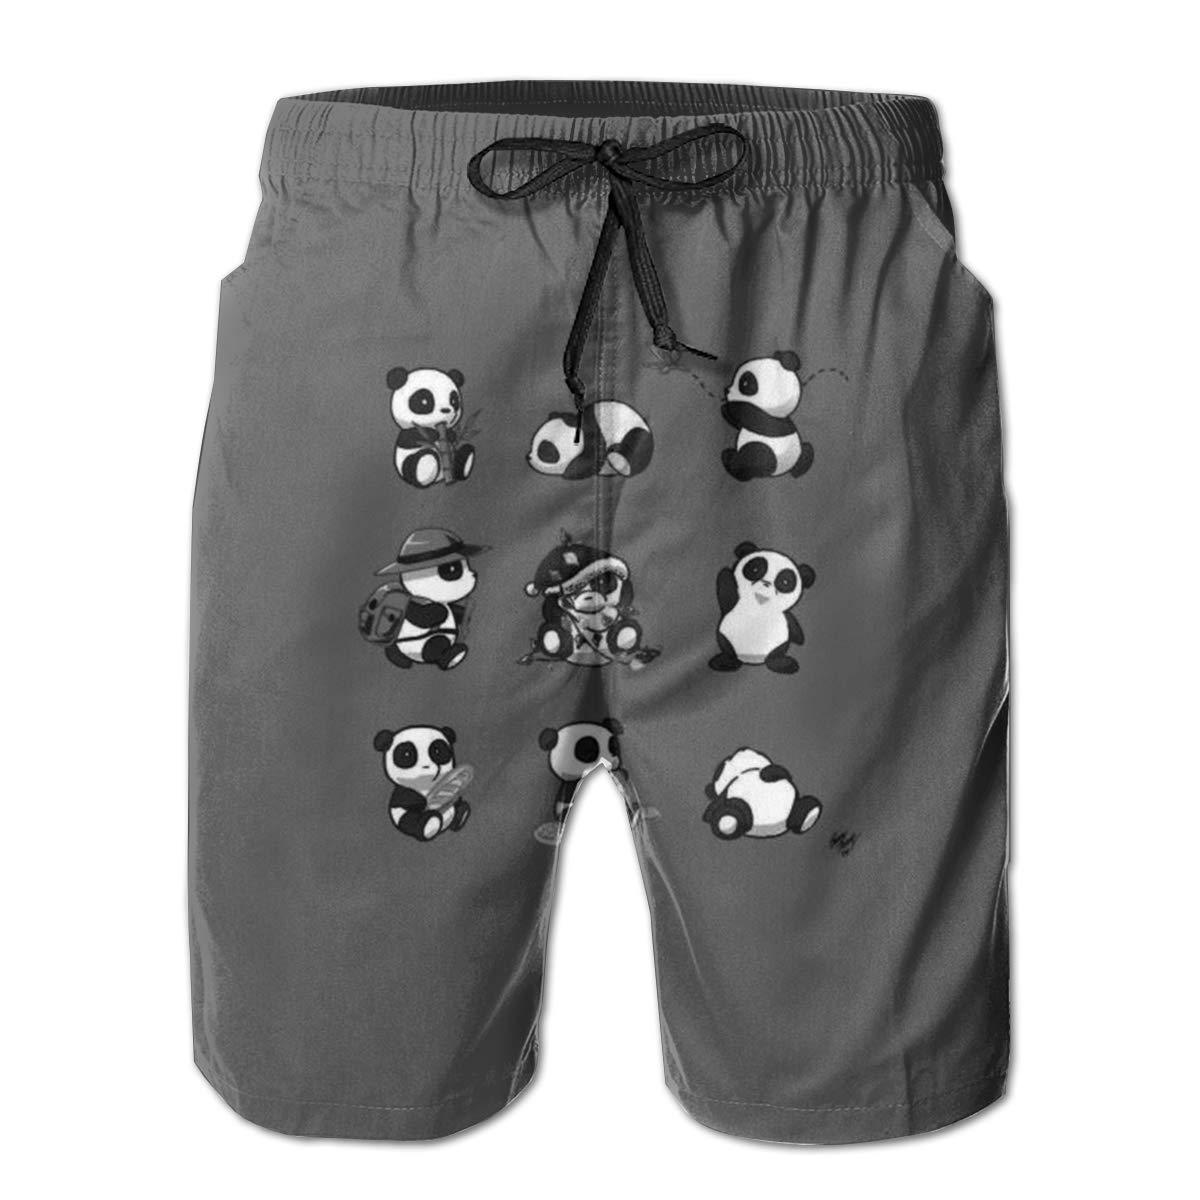 DHVJBC Mens Panad Bear Summer Holiday Quick-Drying Swim Trunks Beach Shorts Board Shorts